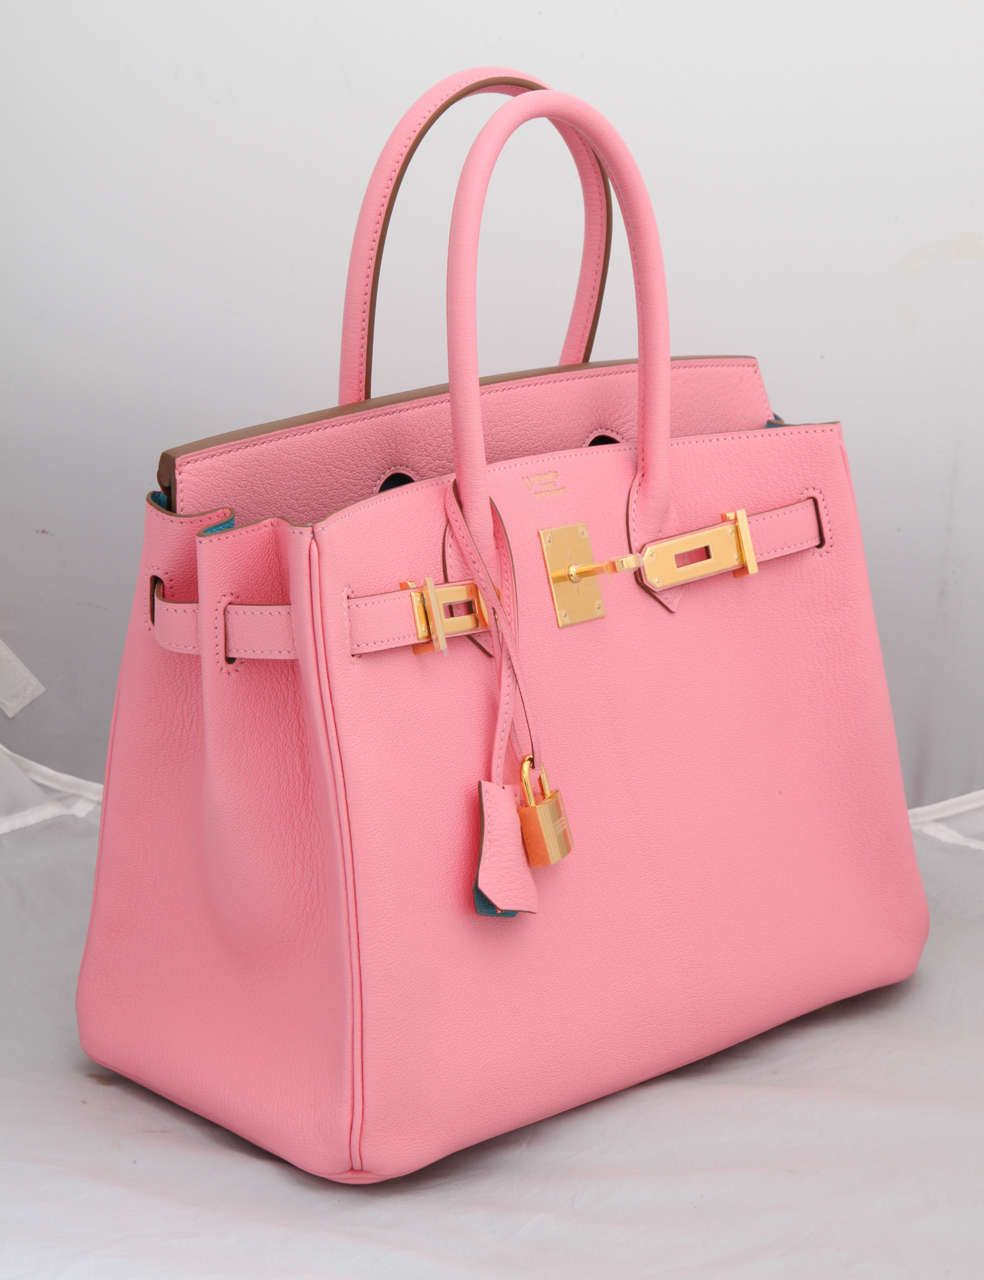 Hermes Rose Confetti Pink Special Order Chevre Birkin With Horseshoe Stamp Louis Vuitton Handbags